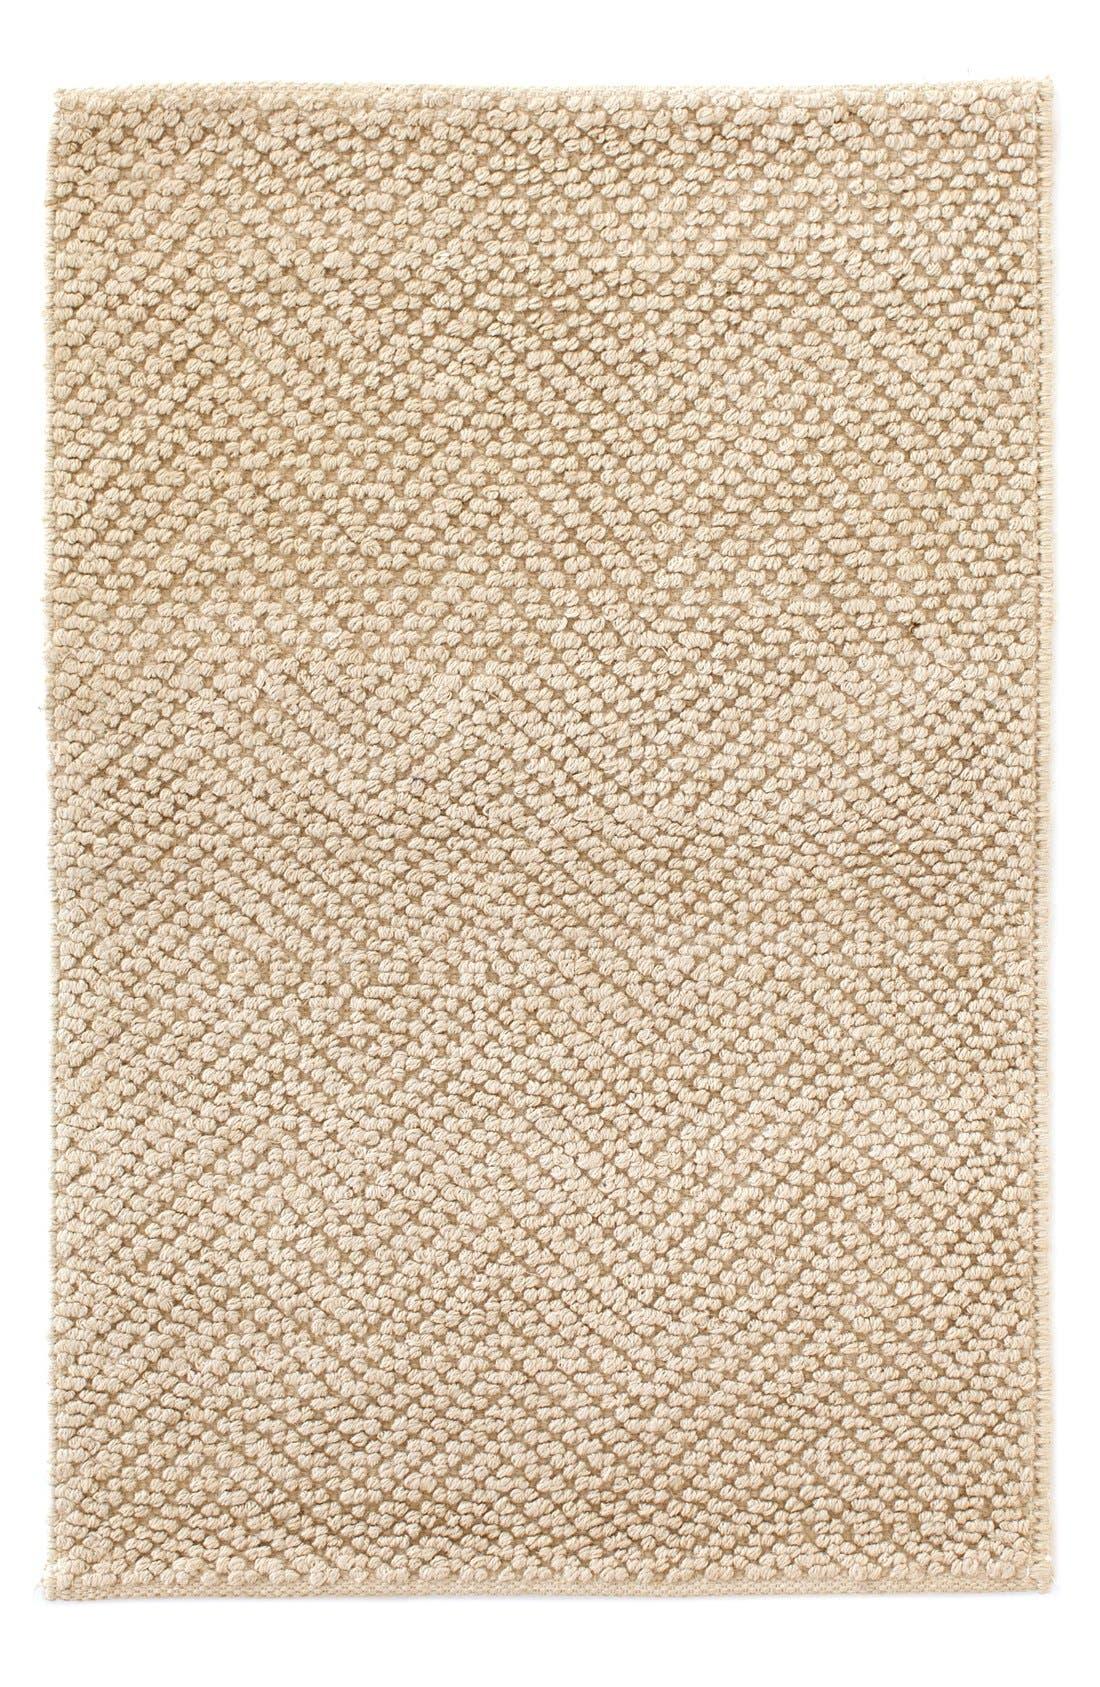 Dash & Albert Woven Jute & Cotton Rug